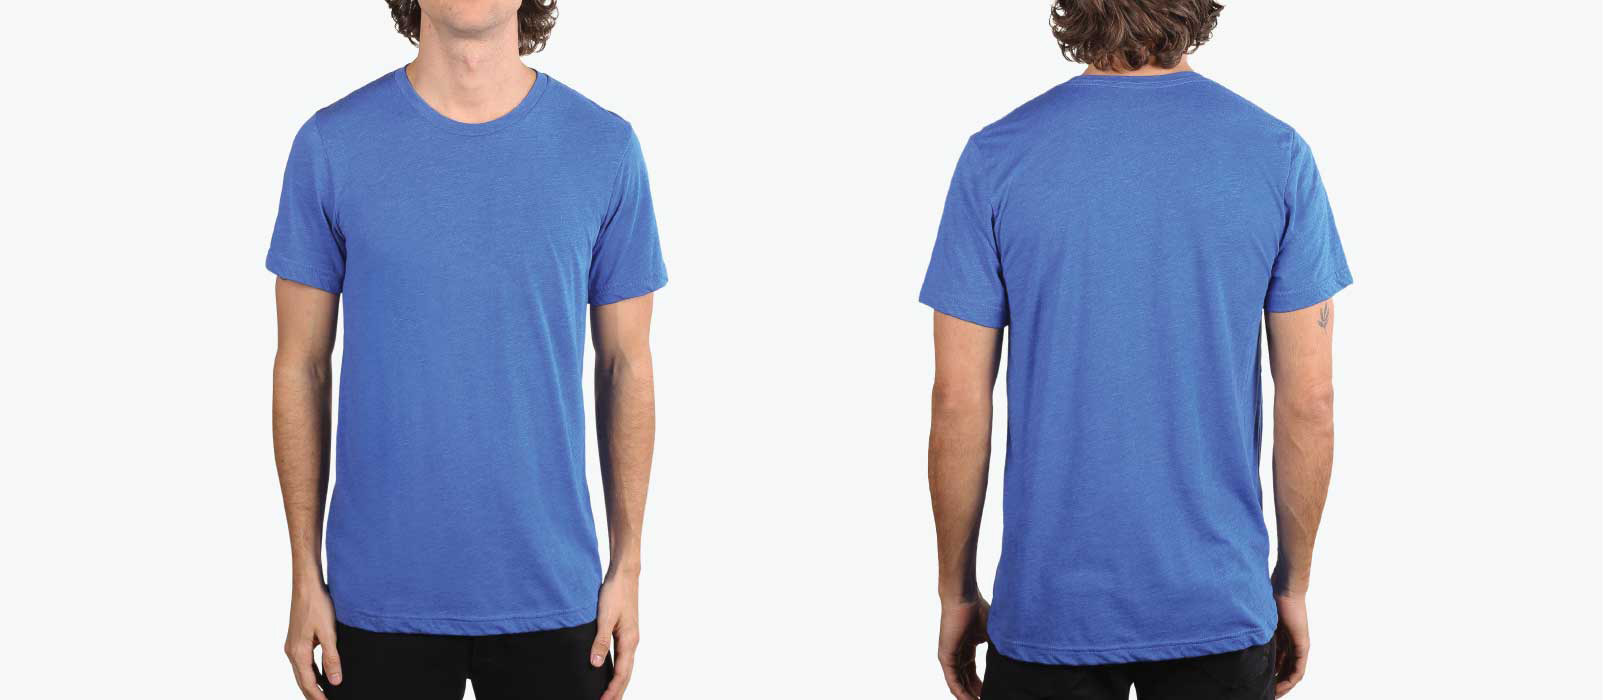 man showing front and back of denim trim-blend shirt